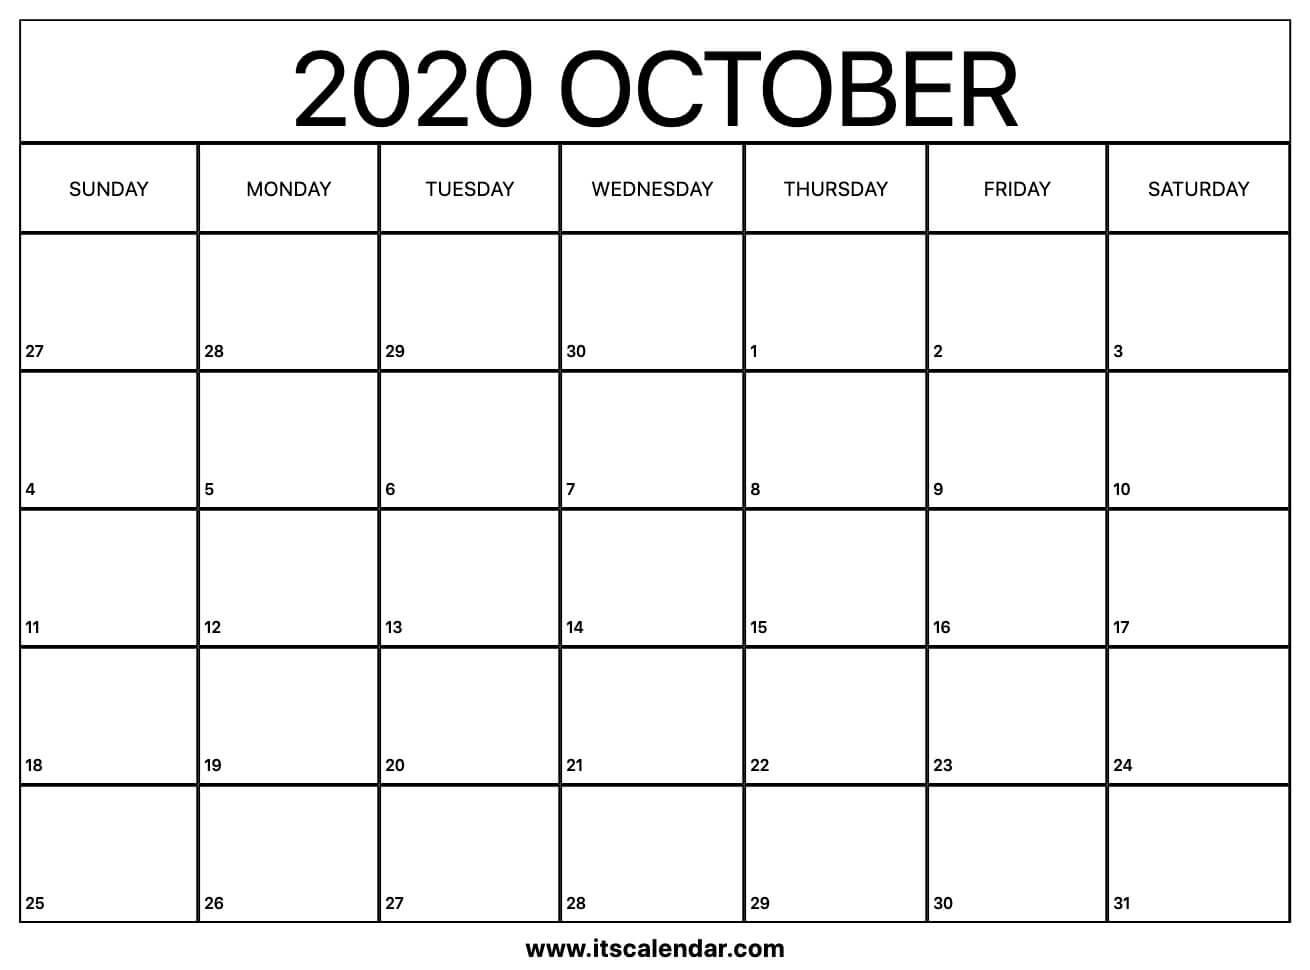 Free Printable October 2020 Calendar within Printable Calendar Date Range